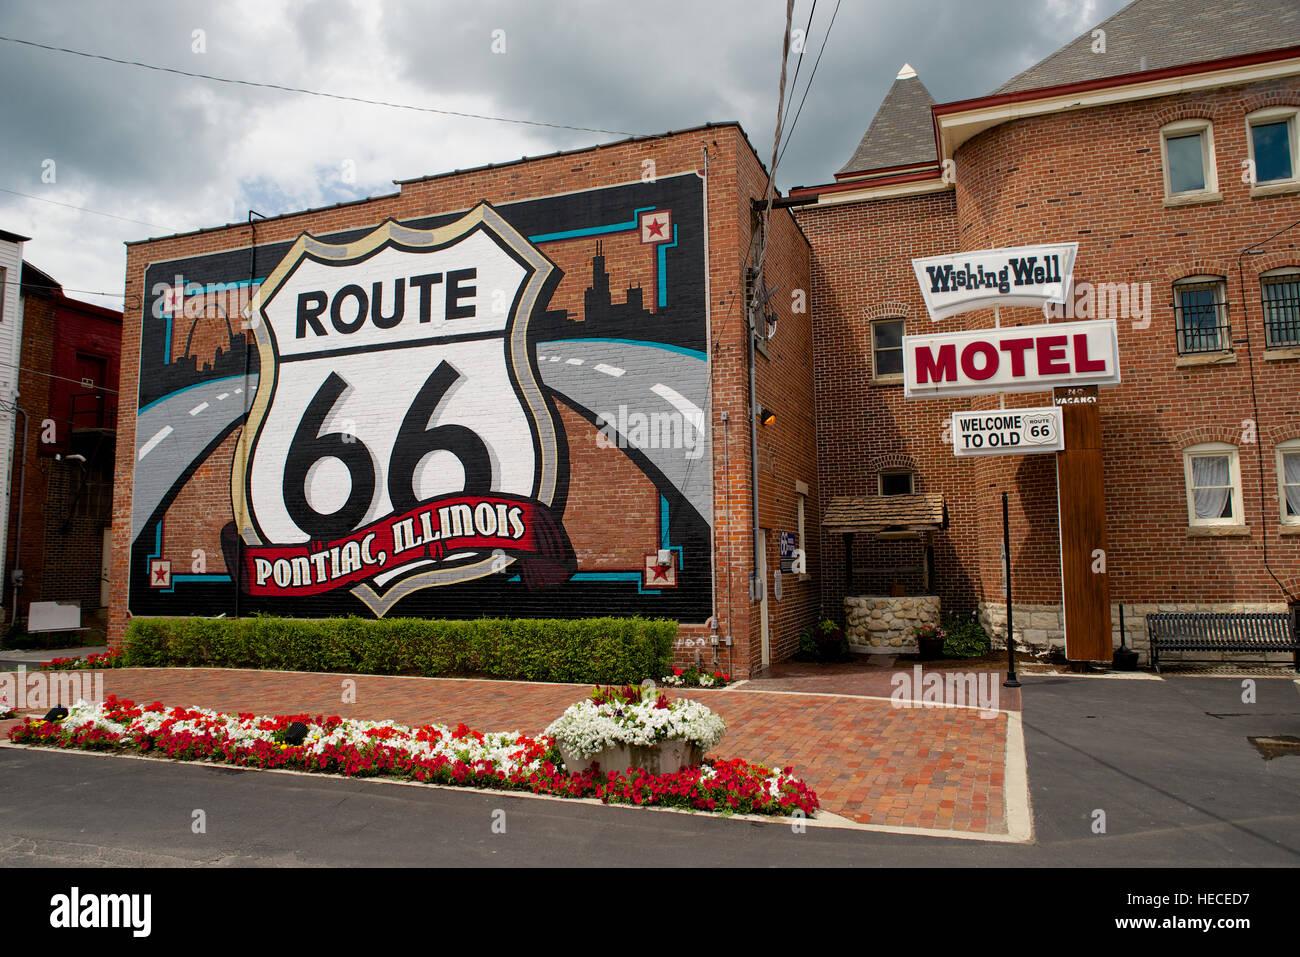 Route 66 Shield Mural, Downtown Pontiac, Livingston County, Illinois, USA. - Stock Image